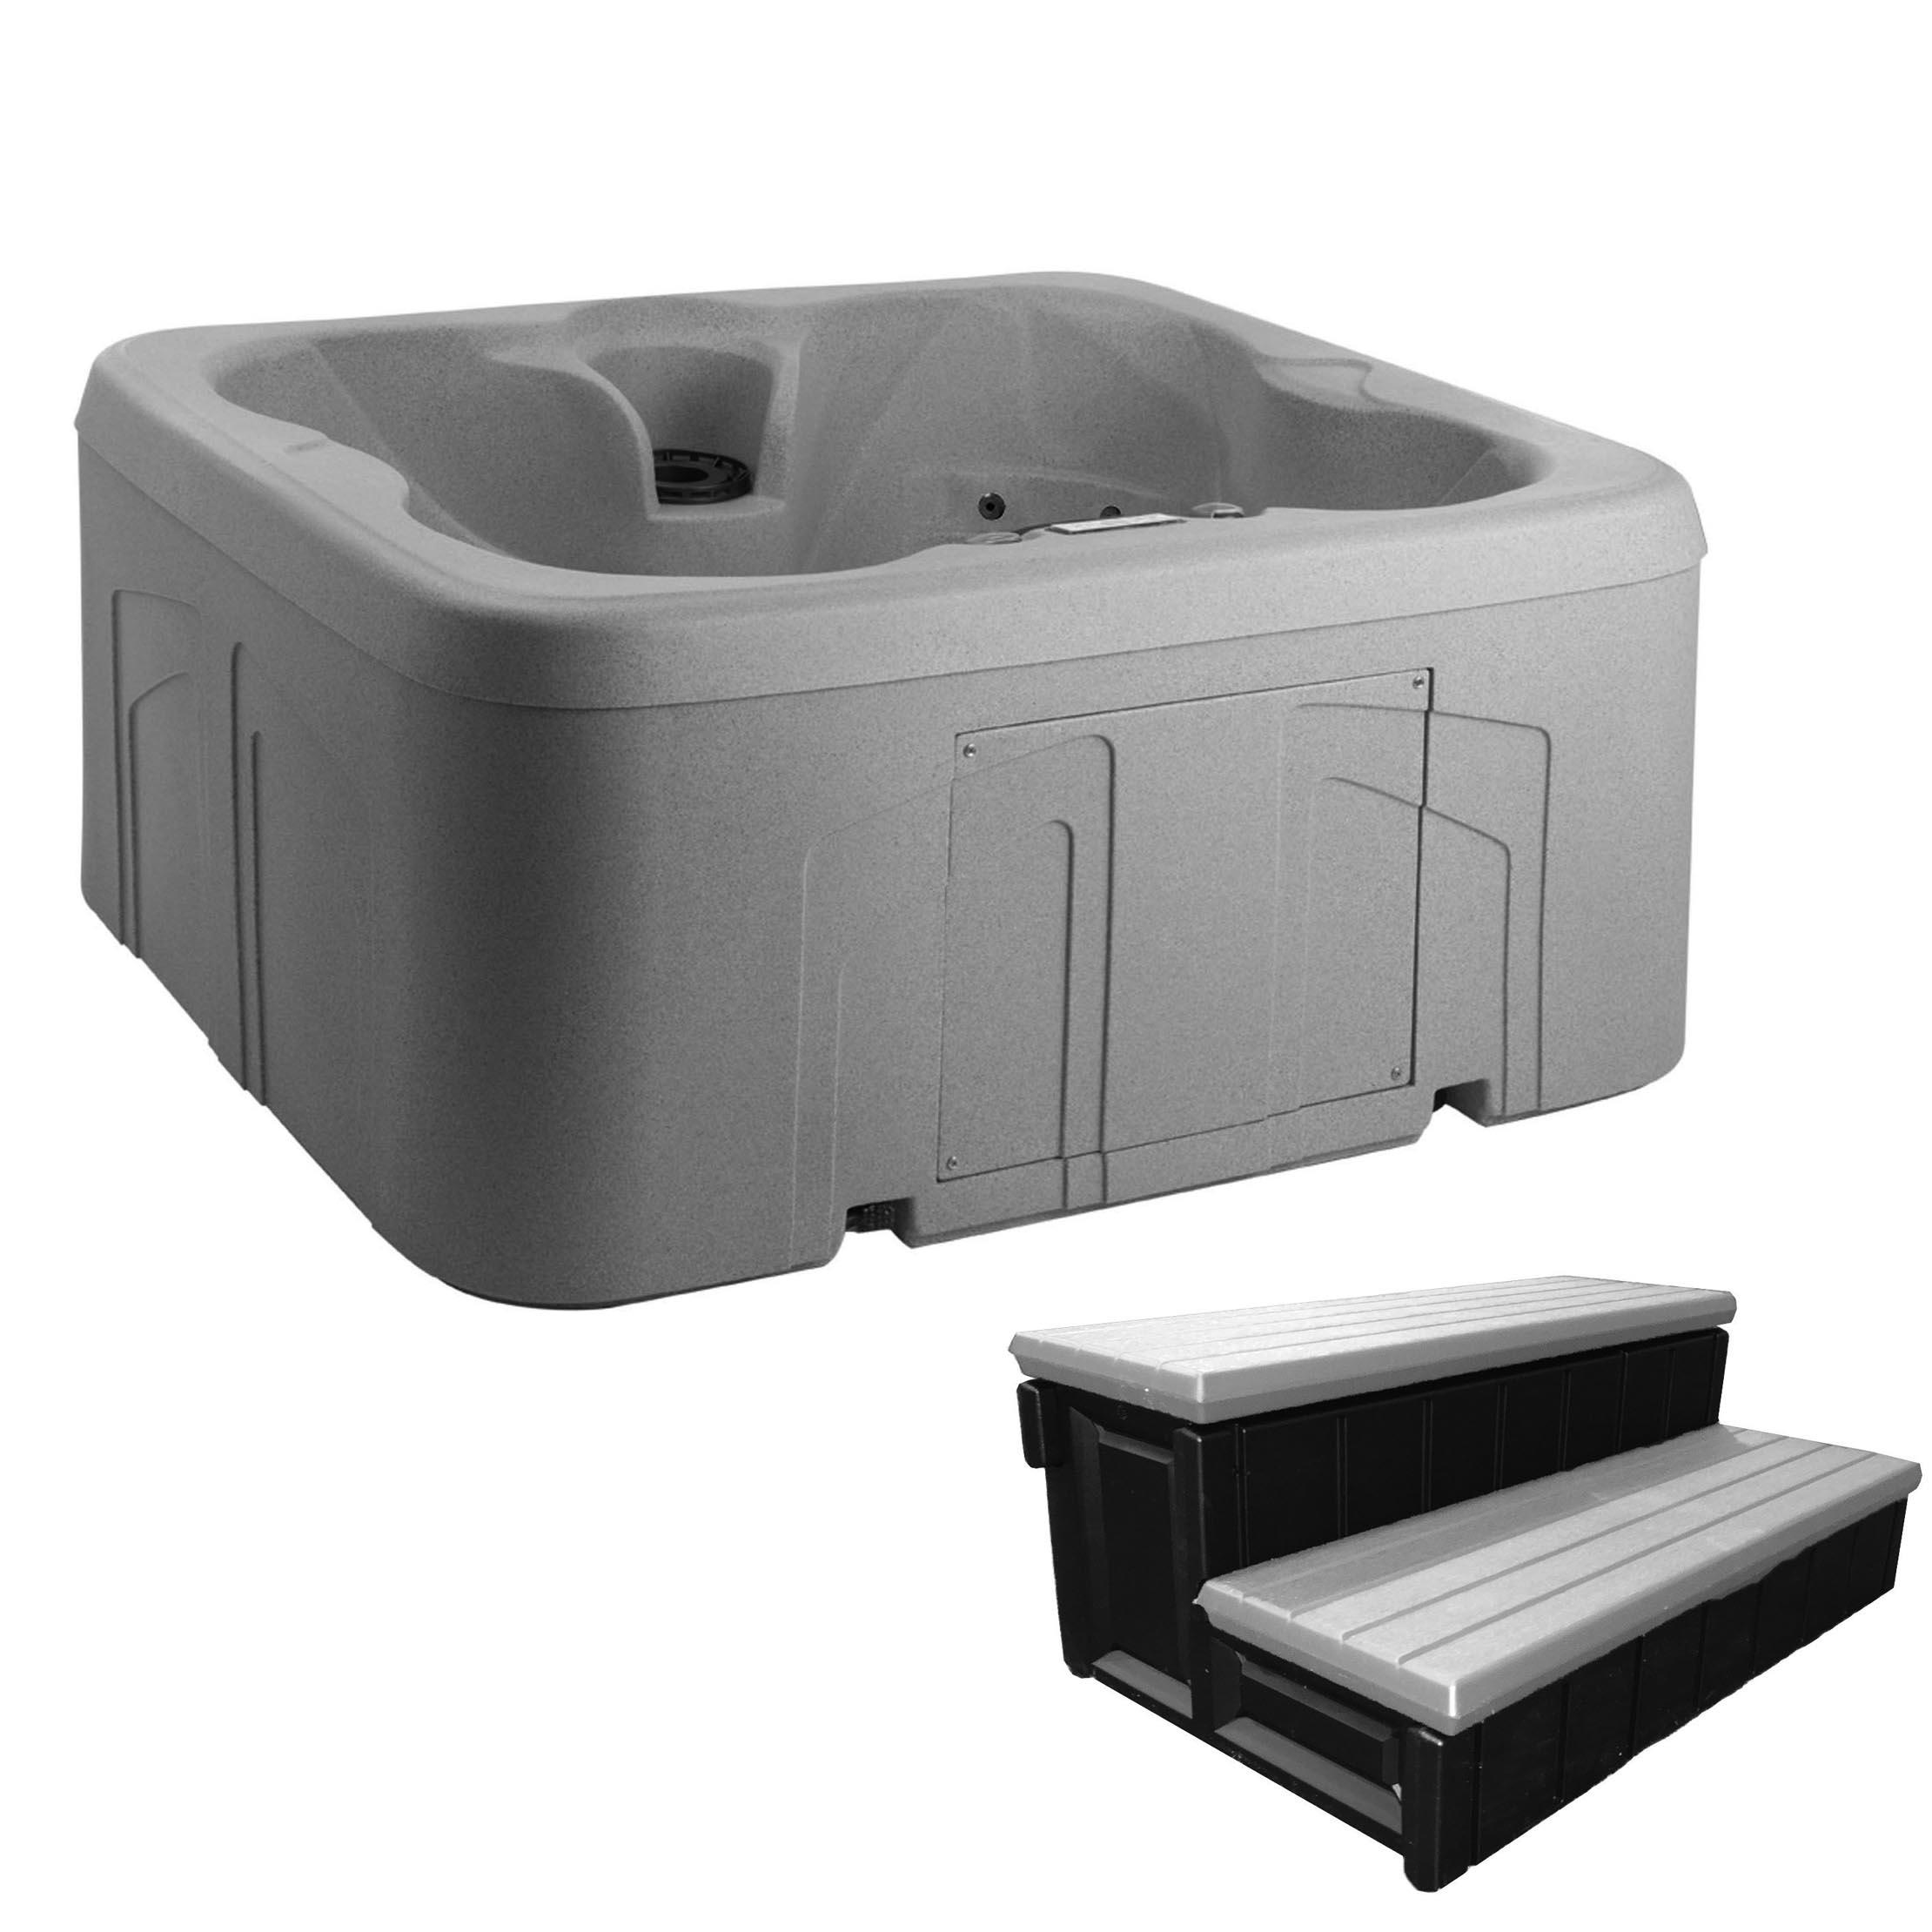 LifeSmart Getaway 4-Person Hot Tub Spa with Matching Spa Step by Lifesmart